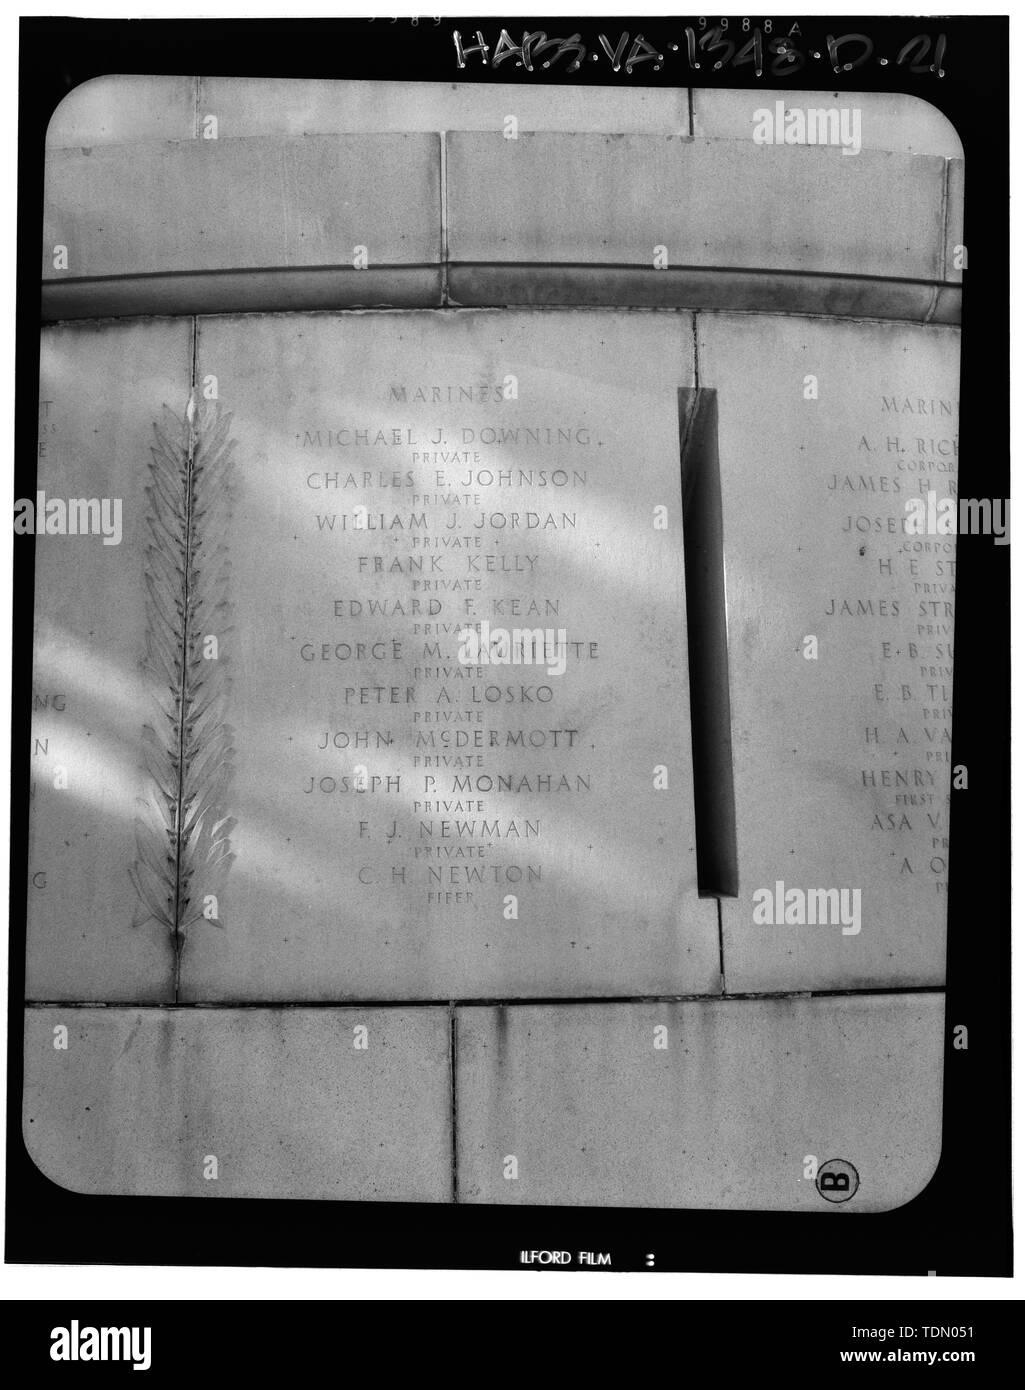 Panel 11 - Arlington National Cemetery, USS Maine Memorial, Arlington, Arlington County, VA; U.S. Army Corps of Engineers; Wyeth, Nathan C; Black, William M; Patrick, Mason M; Ferguson, H B; Bixby, W H; Goodson, W F; Lackawanna Steel Company; T.L. Huston Construction Company; Harris Brothers; Clark, D Lombillo; Primelles, Arturo; Rhodes, D H; Jenkins, Oliver B; Tilford, James D; Aleshire, J B; Stimson, H E; Scofield, John J; Hugh, R P; Houston, J B; Sharpe, Henry G; Downey, G F; Clem, L; Cosby, Spencer; Taft, William Howard; Commission of Fine Arts; Olmsted, Fredrick Law; French, Daniel Cheste - Stock Image